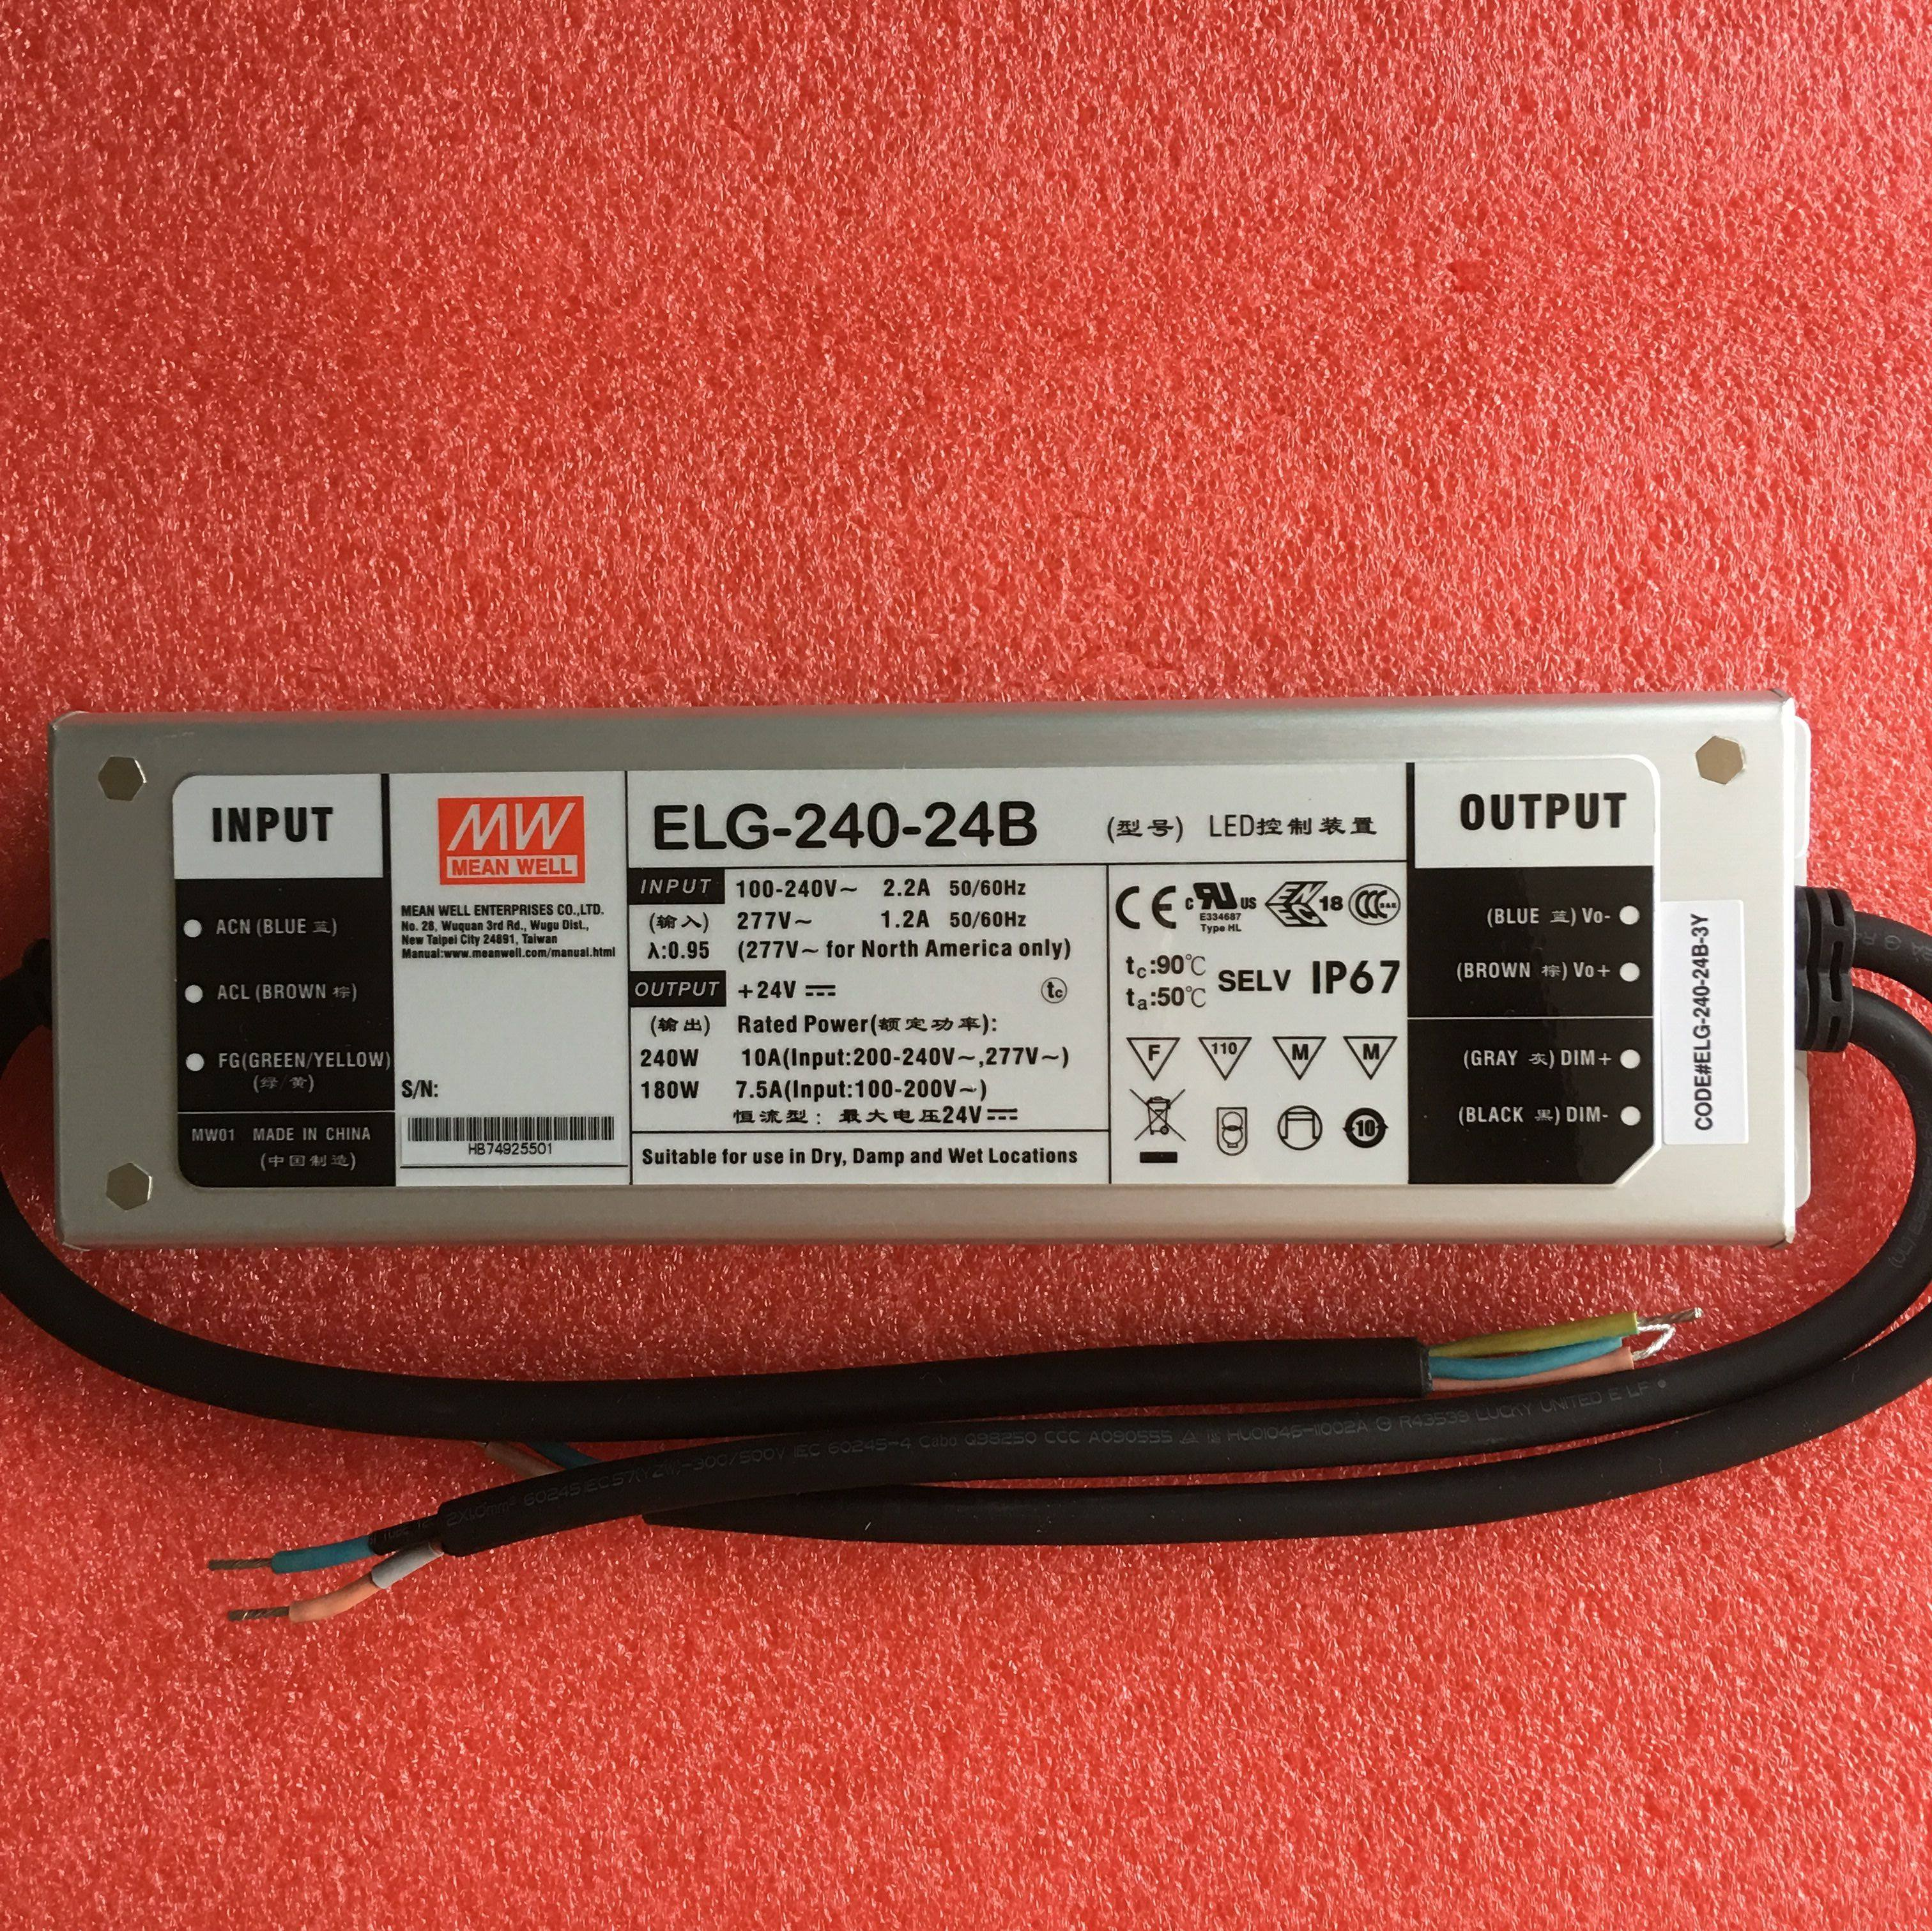 LPV-100-48 LED Fuente de alimentaci/ón 100W 48V 2,1A ; MeanWell